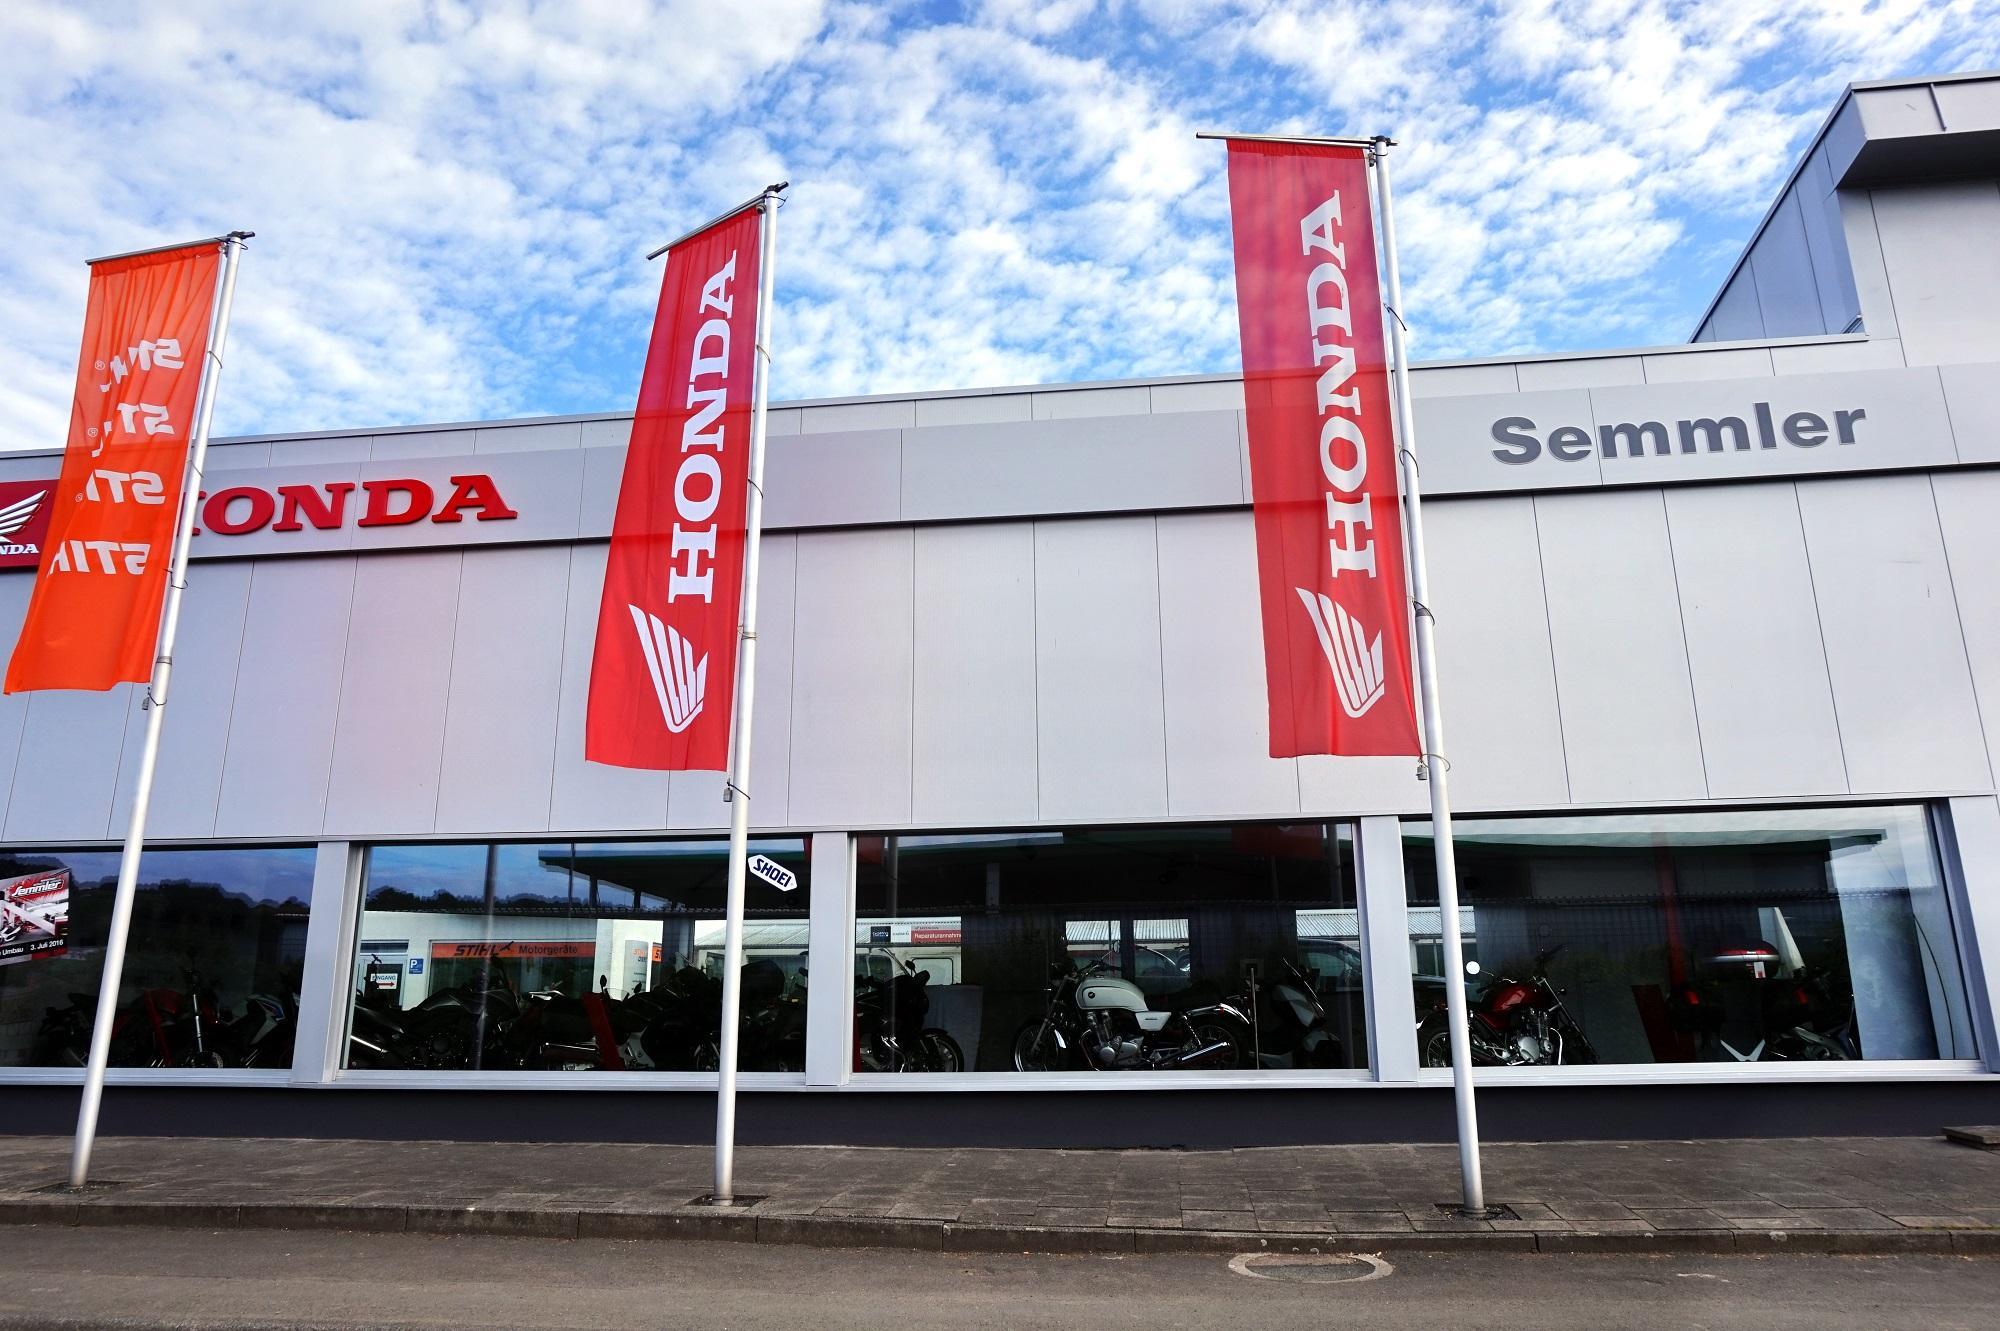 Unternehmensbilder Honda Semmler GbR 10